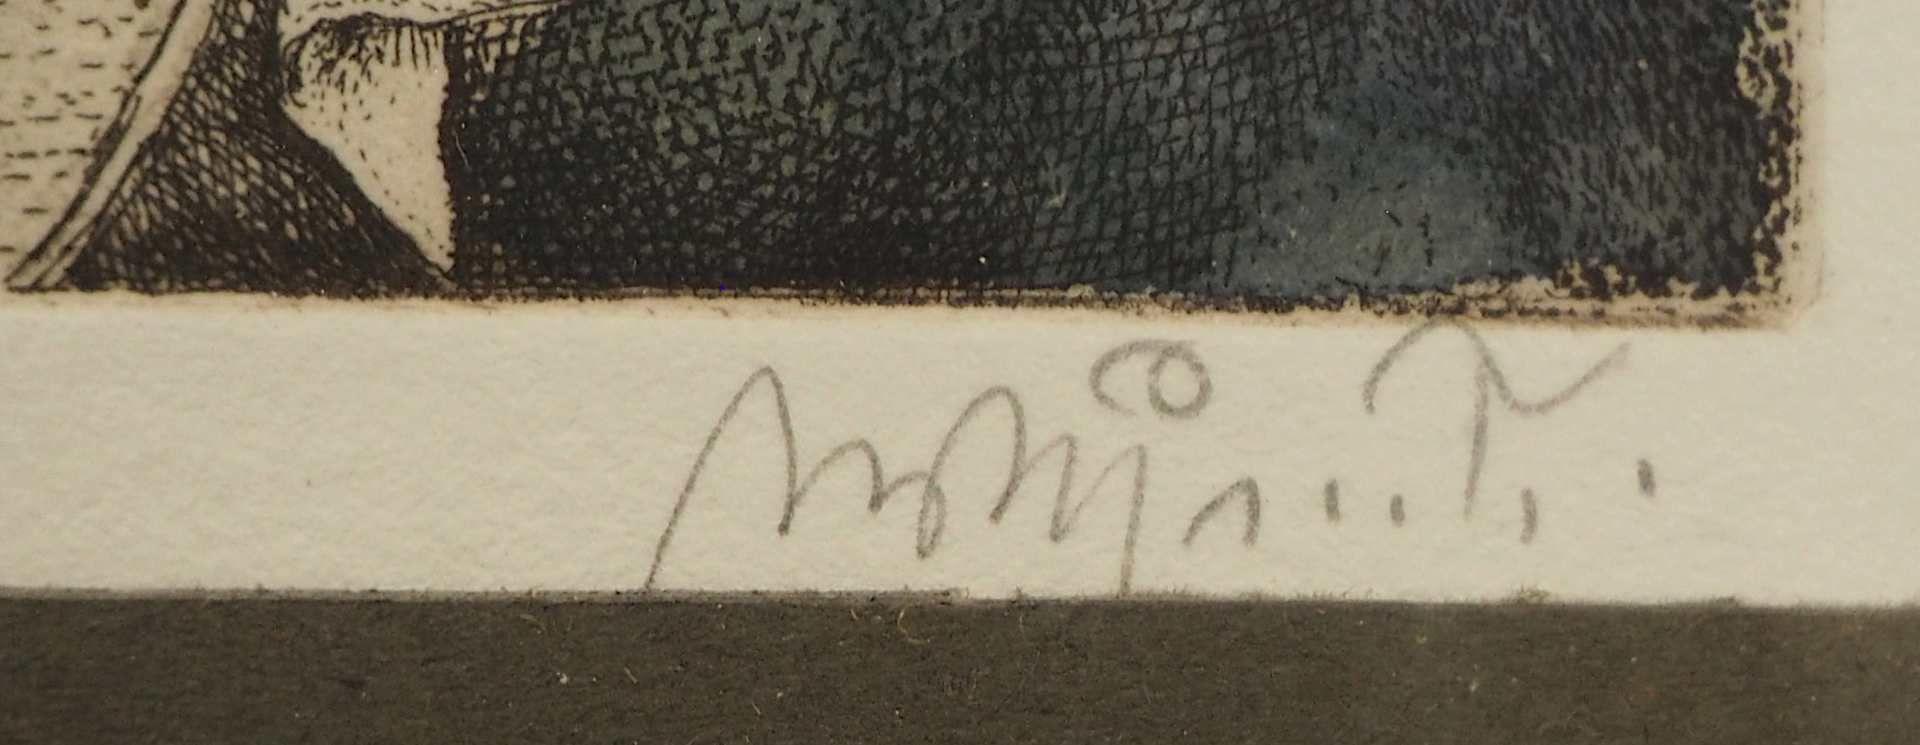 "1 Farblithografie R.u. bleistiftsign. M. M. PRECHTL (wohl Michael Mathias P. 1926-2003), ""Rembra - Bild 4 aus 6"